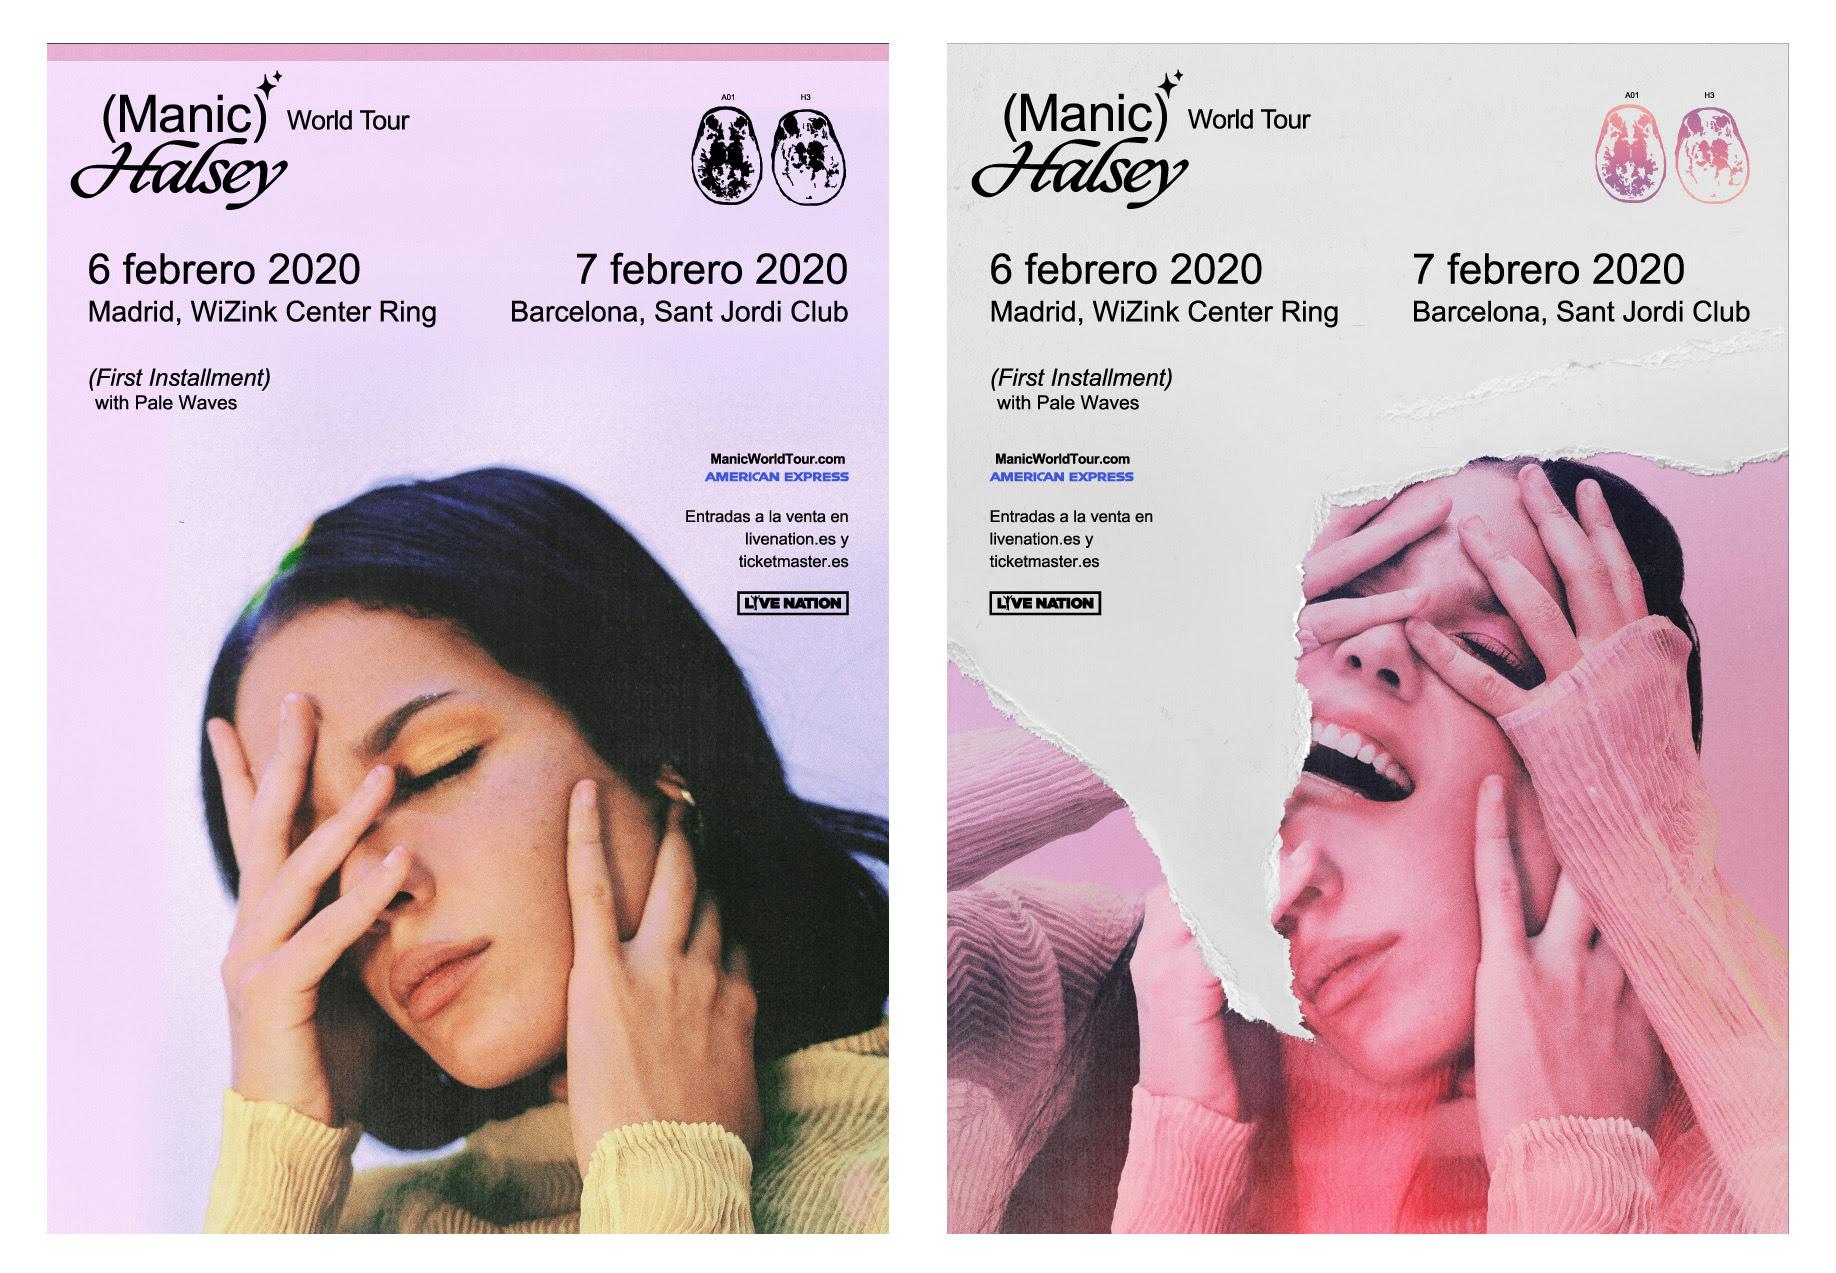 Halsey-Maniac World Tour 2020-Madrid-Barcelona